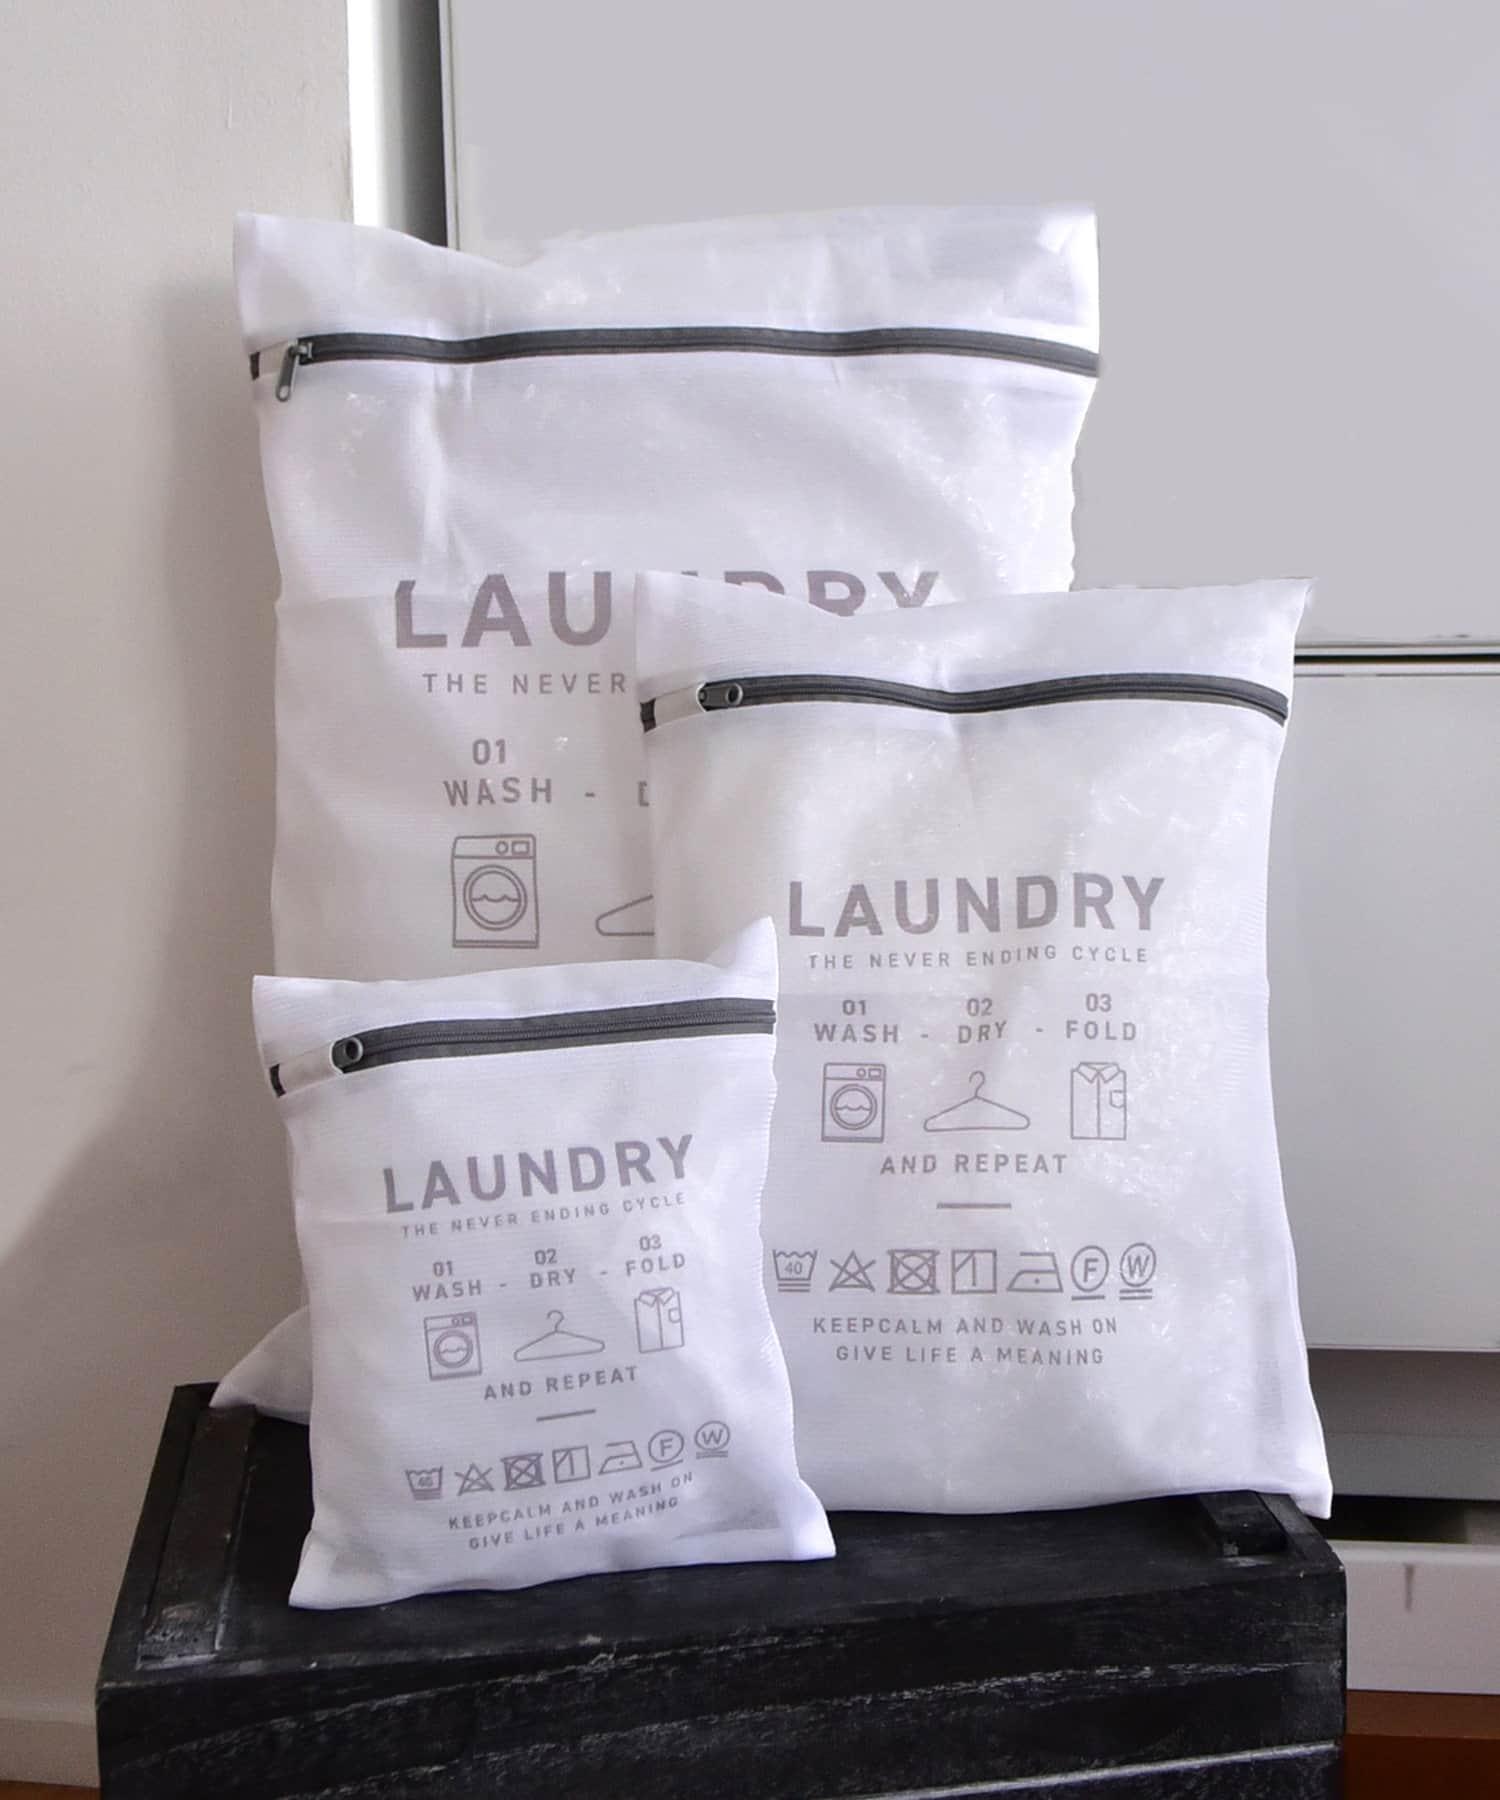 3COINS(スリーコインズ) ライフスタイル 【お洗濯をより快適に】ランドリーネットスクエア3枚セット グレー